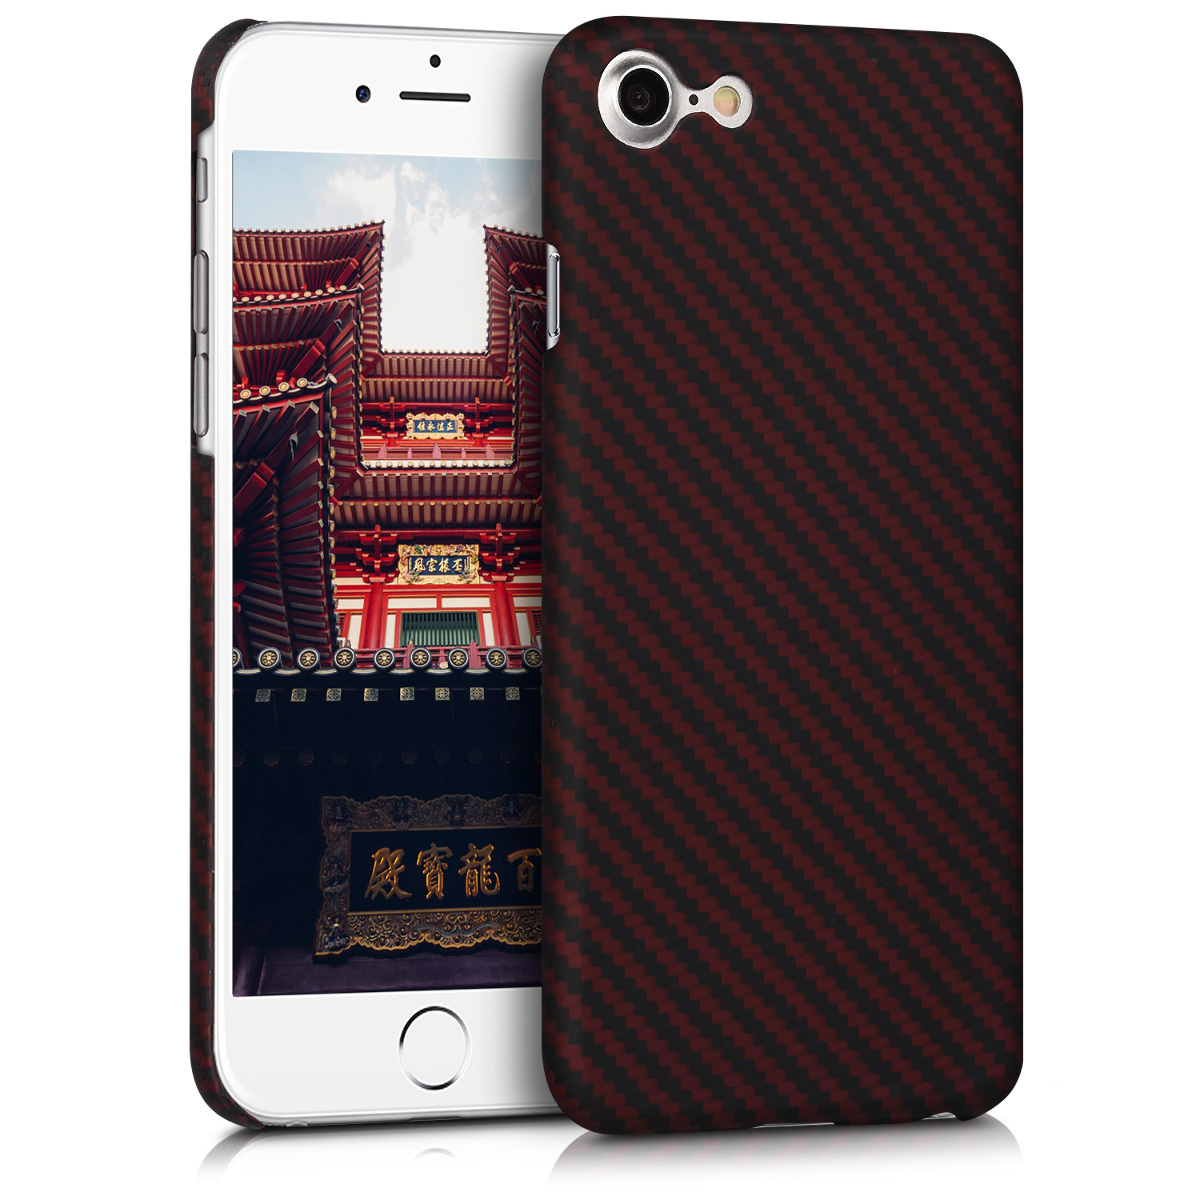 Kalibri Aramid Fiber Body - Σκληρή Θήκη iPhone 7 / 8 - Red / Black (42082.09)